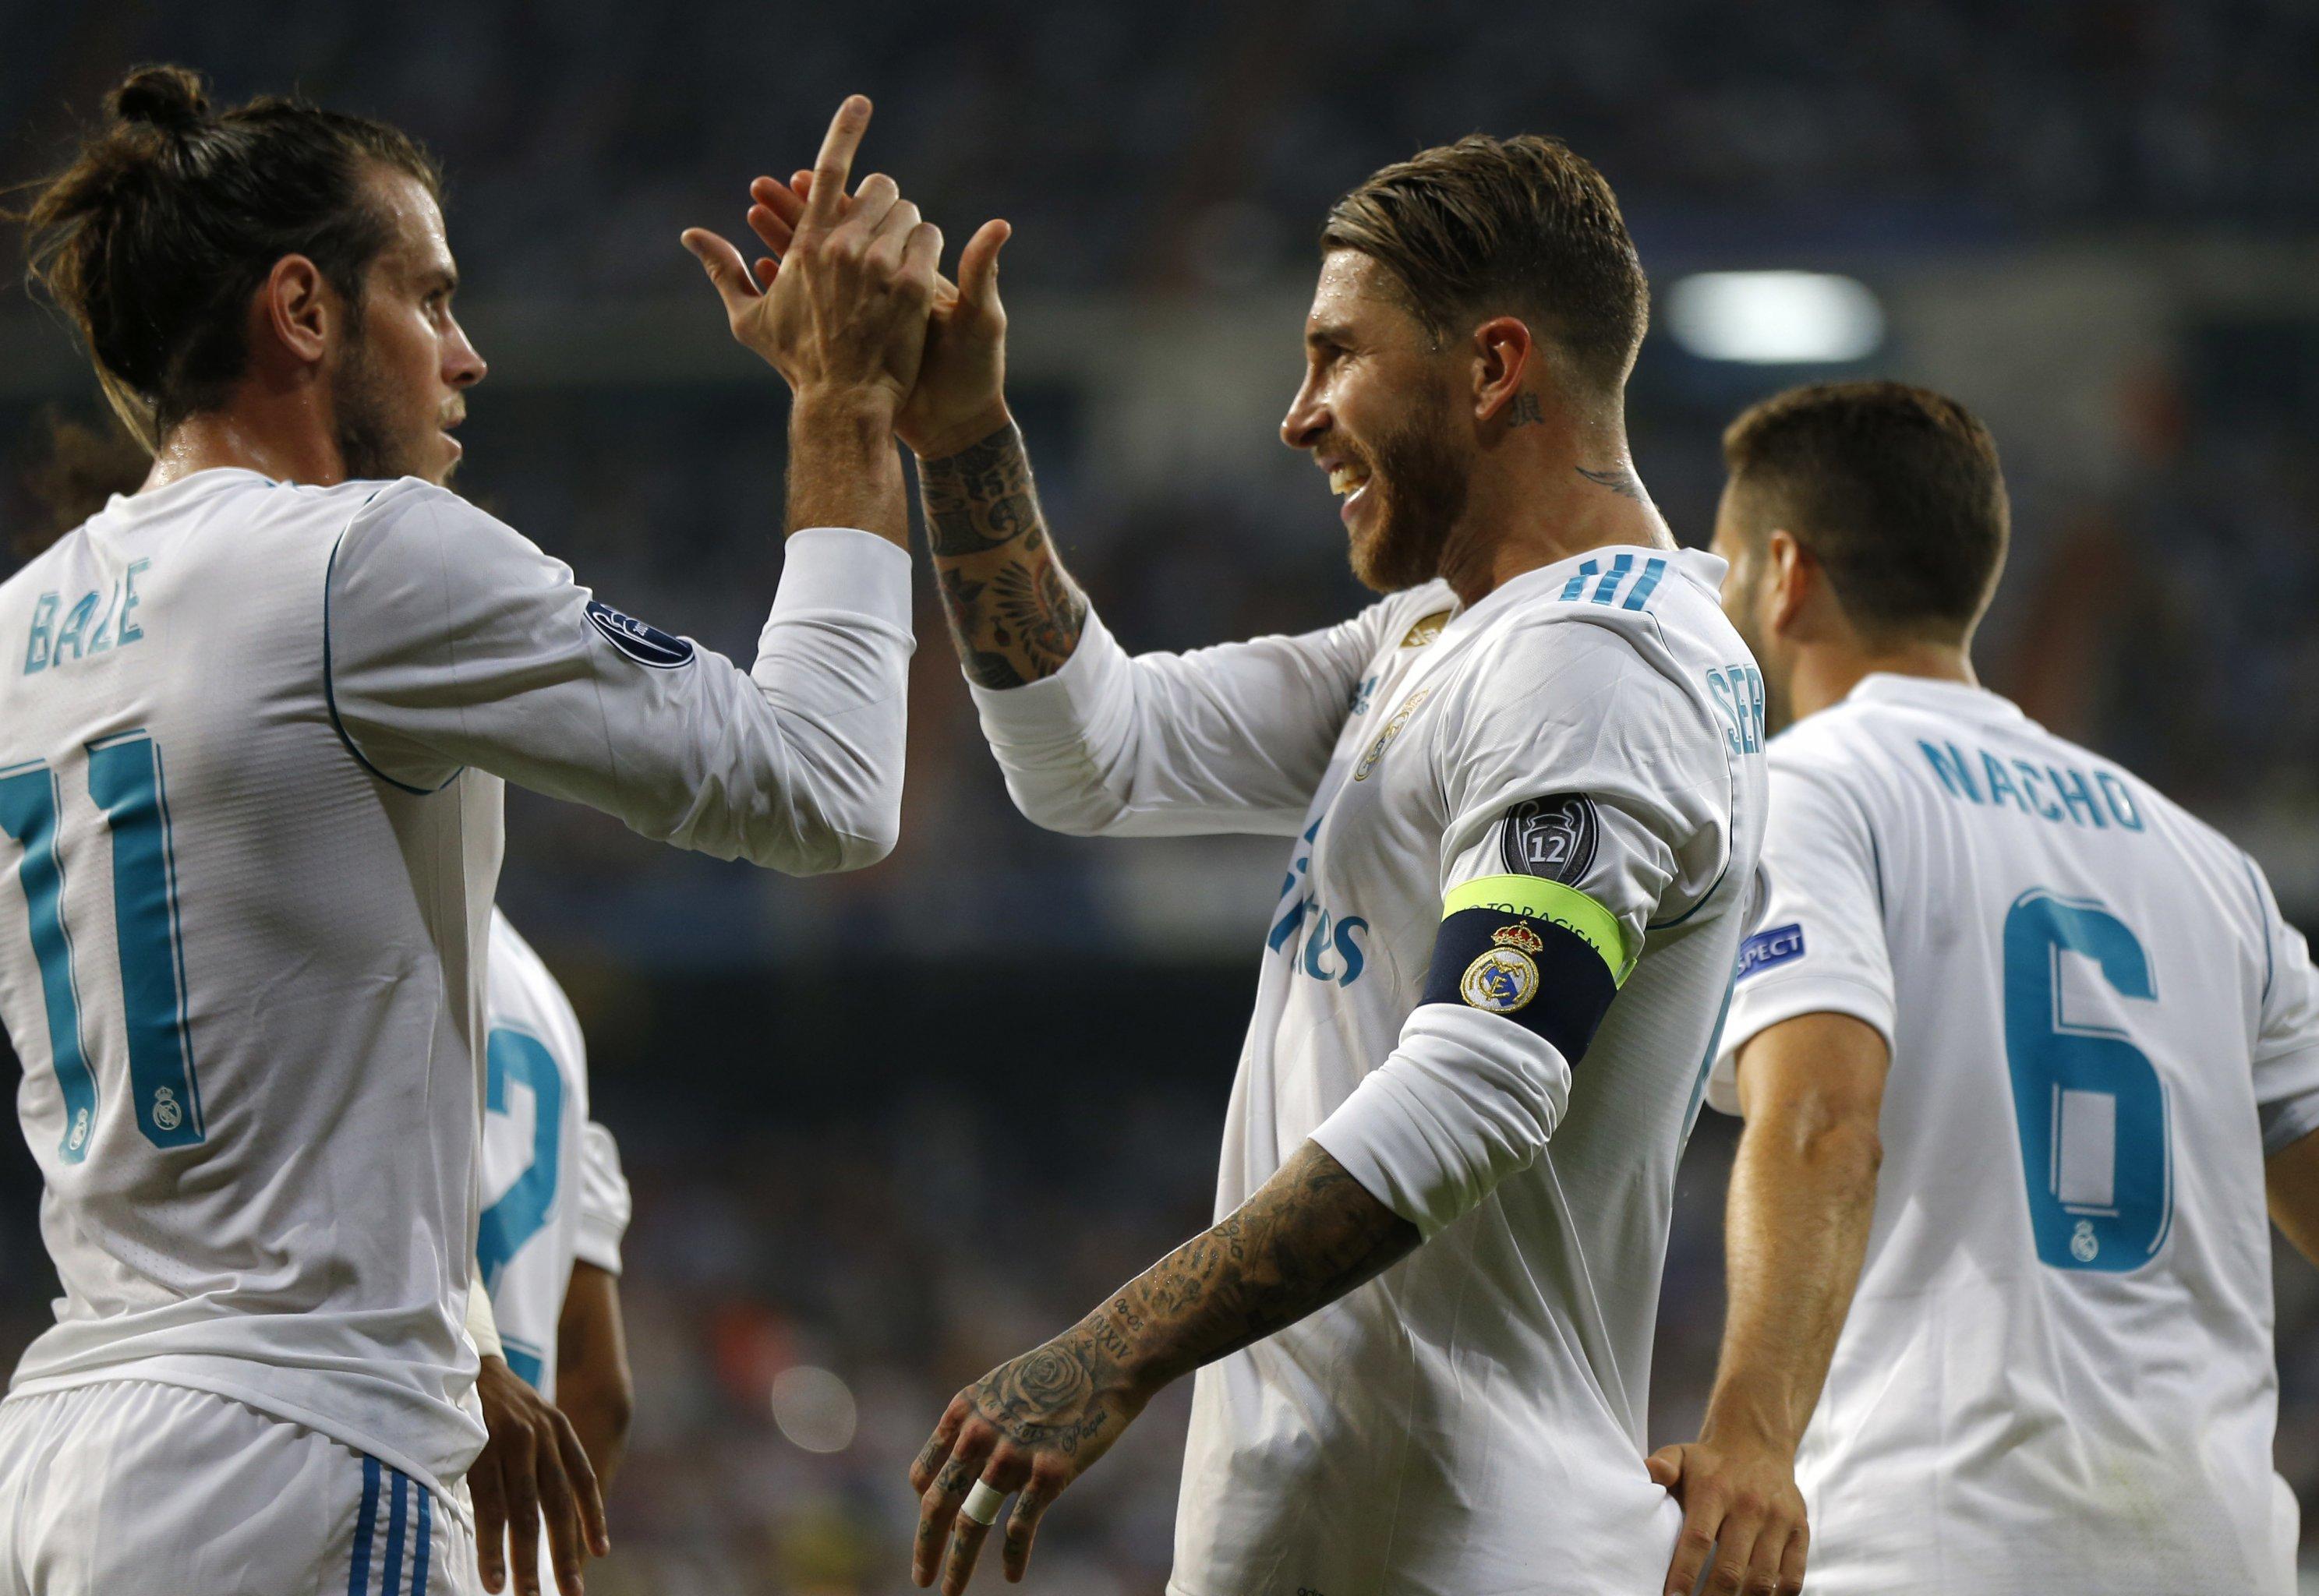 B/R Experts' Champions League Last-16 Predictions | Bleacher